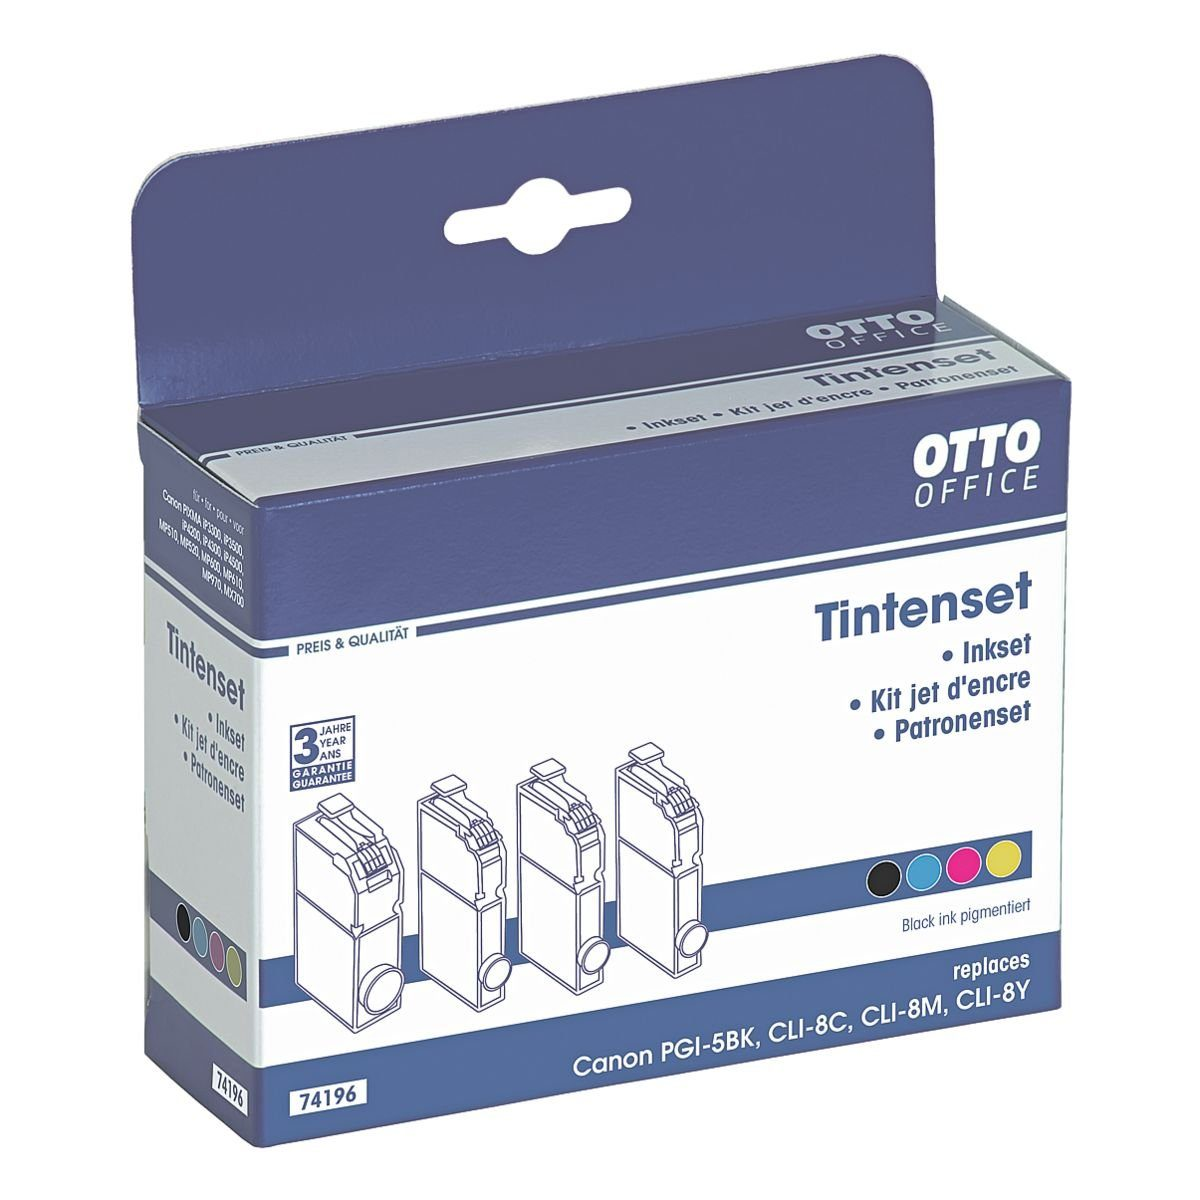 OTTO Office Standard Tintenpatronen-Set ersetzt Canon »PGI-5BK + CLI8C,M,Y...